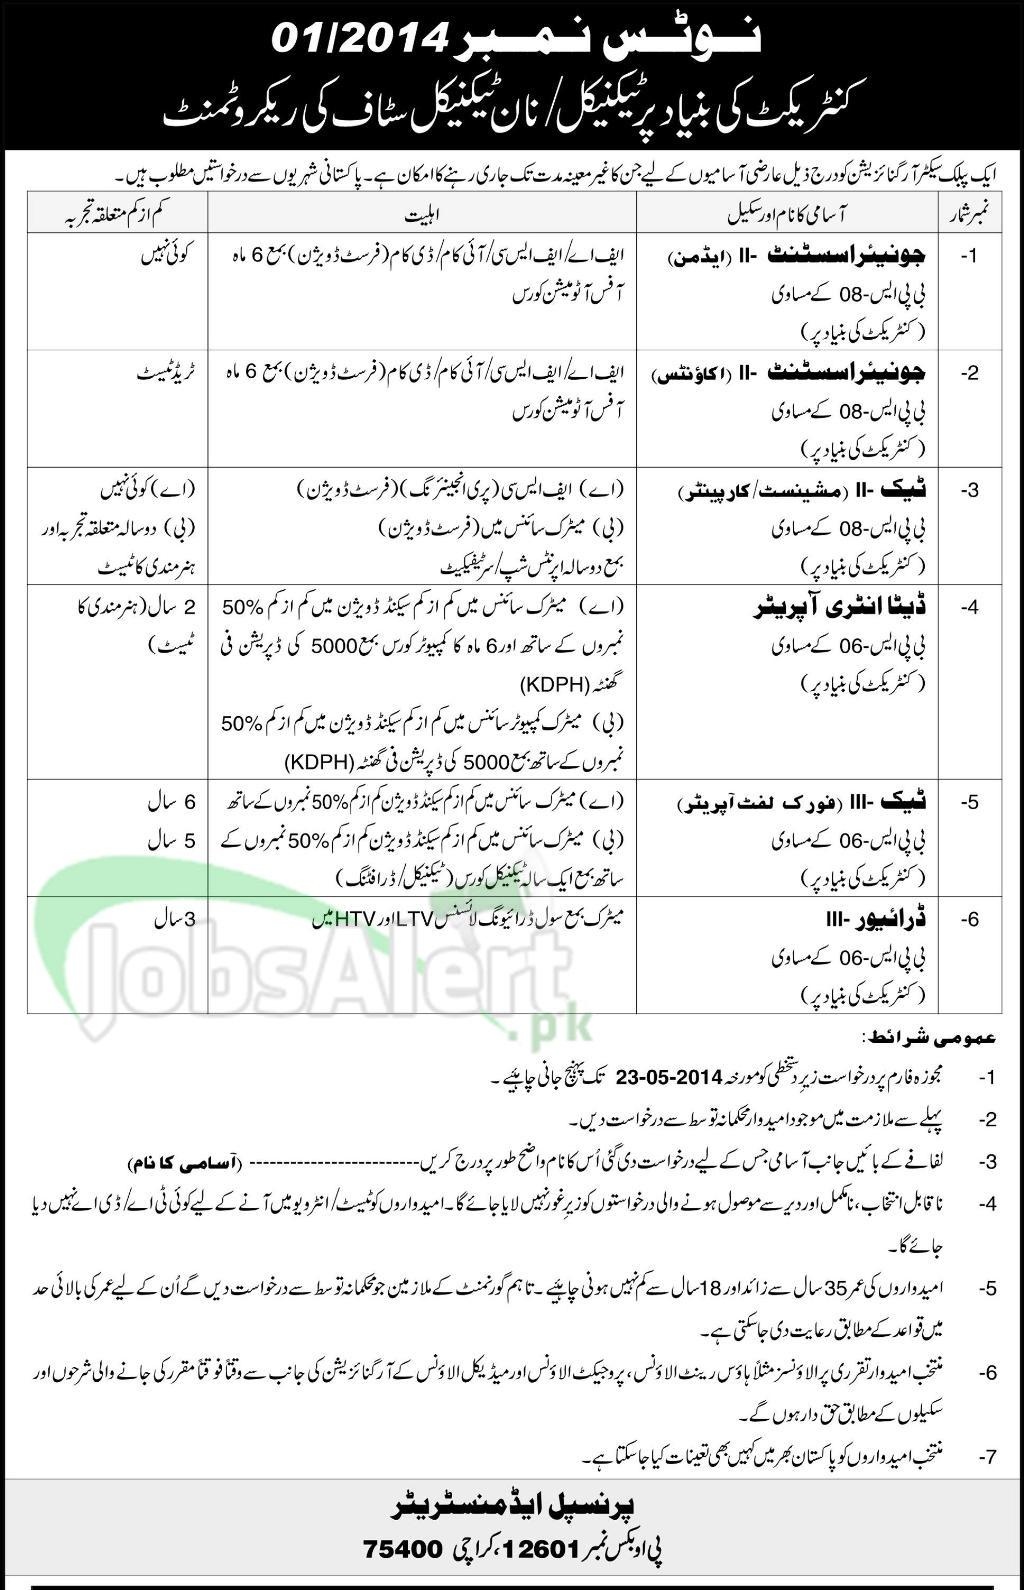 Public Sector Organization Karachi